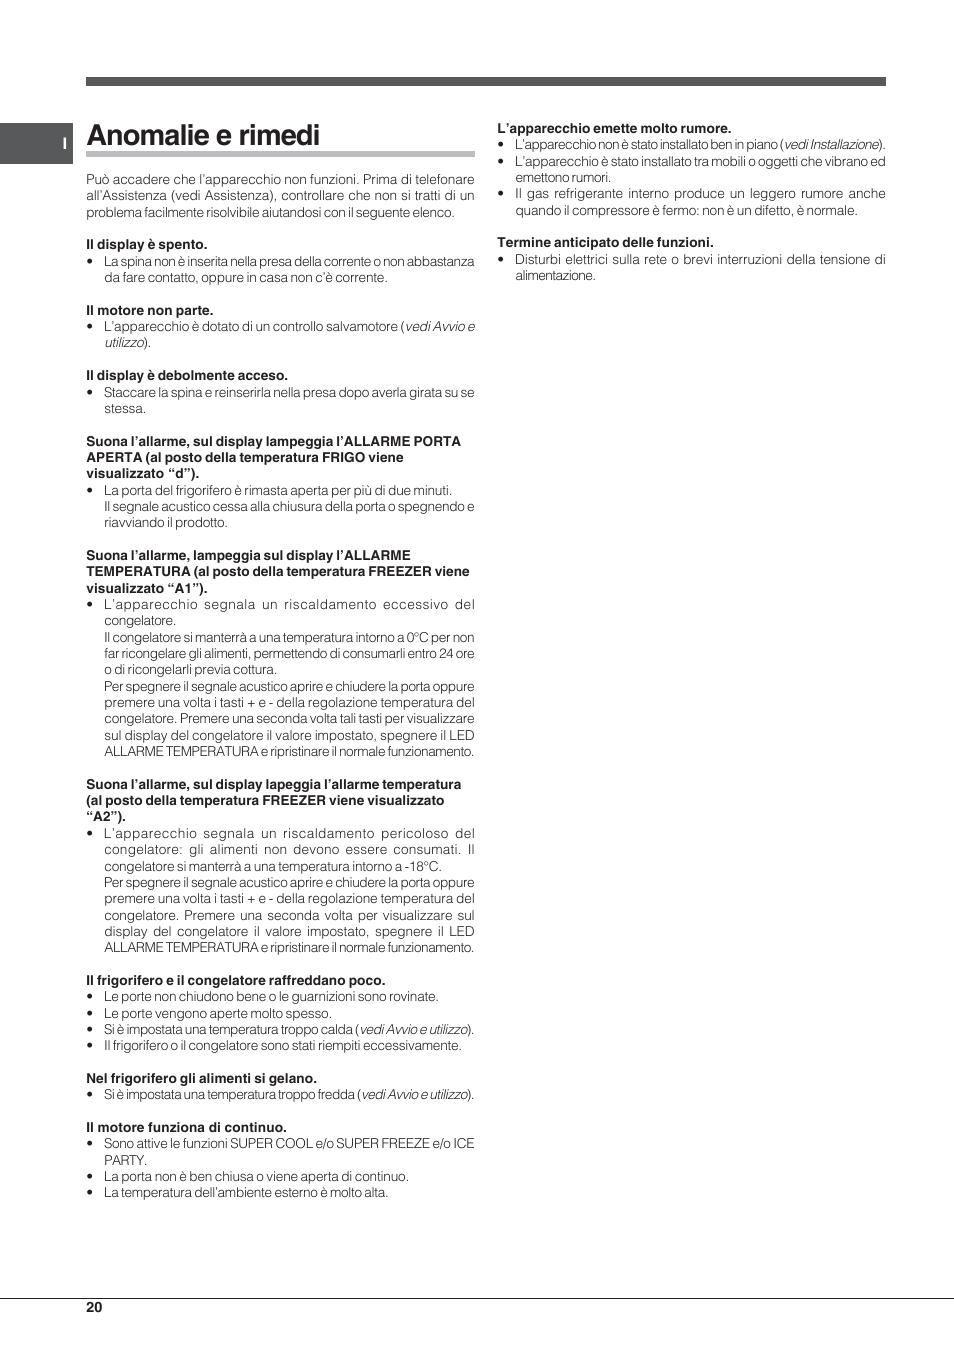 Casa Troppo Calda Rimedi anomalie e rimedi   indesit pbaa 33 f d user manual   page